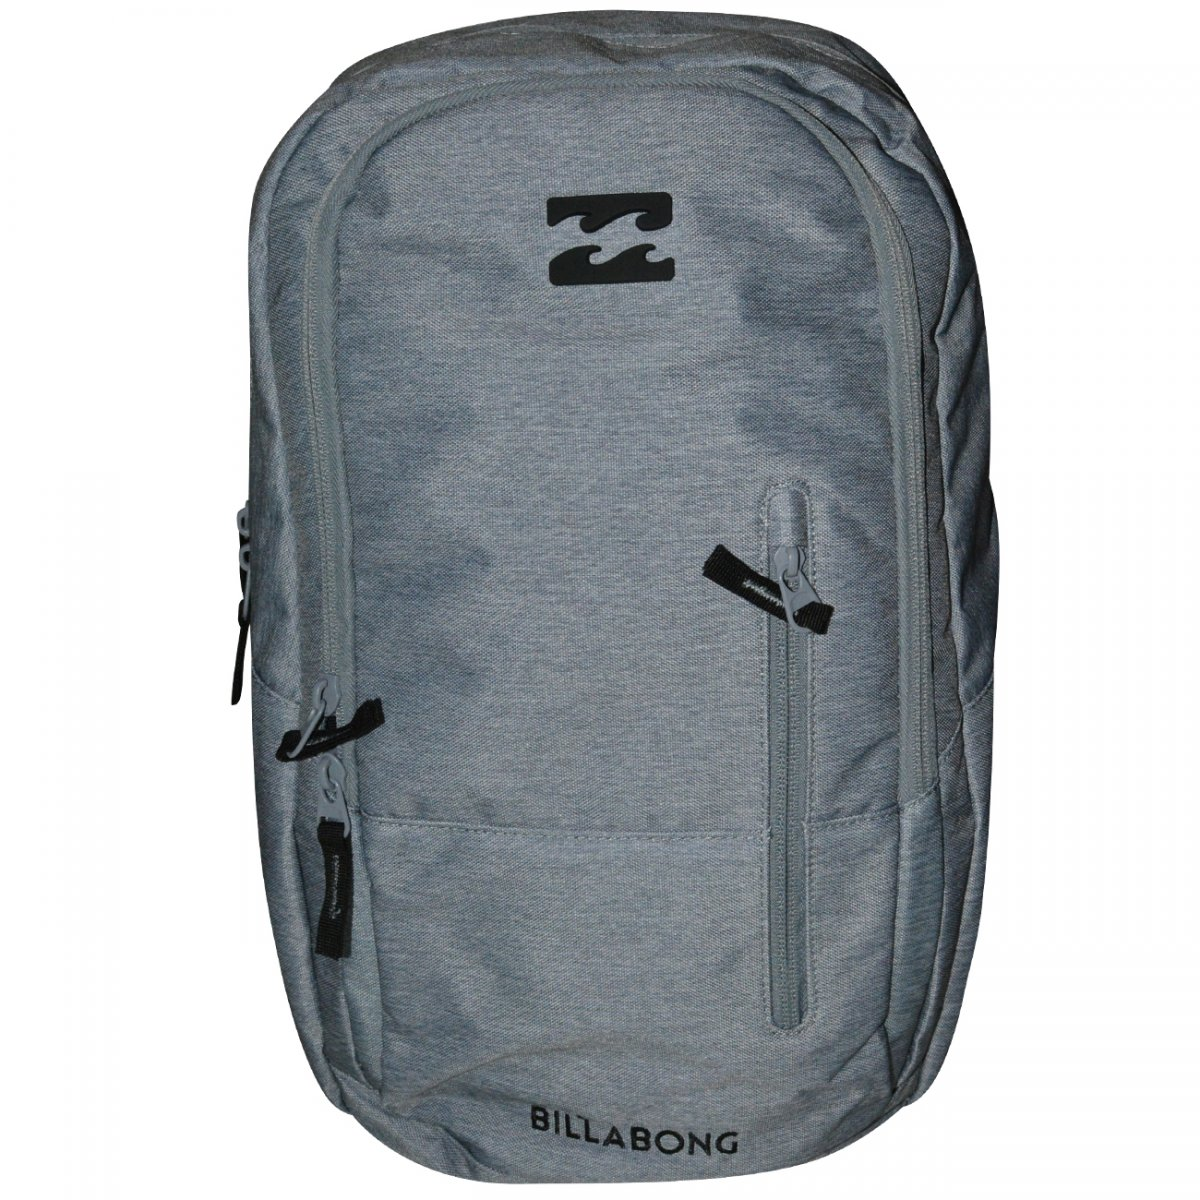 71a7176e1 Mochila Billabong Shadow Pack C5BP03 X0045 - Cinza - Chuteira Nike, Adidas.  Sandalias Femininas. Sandy Calçados